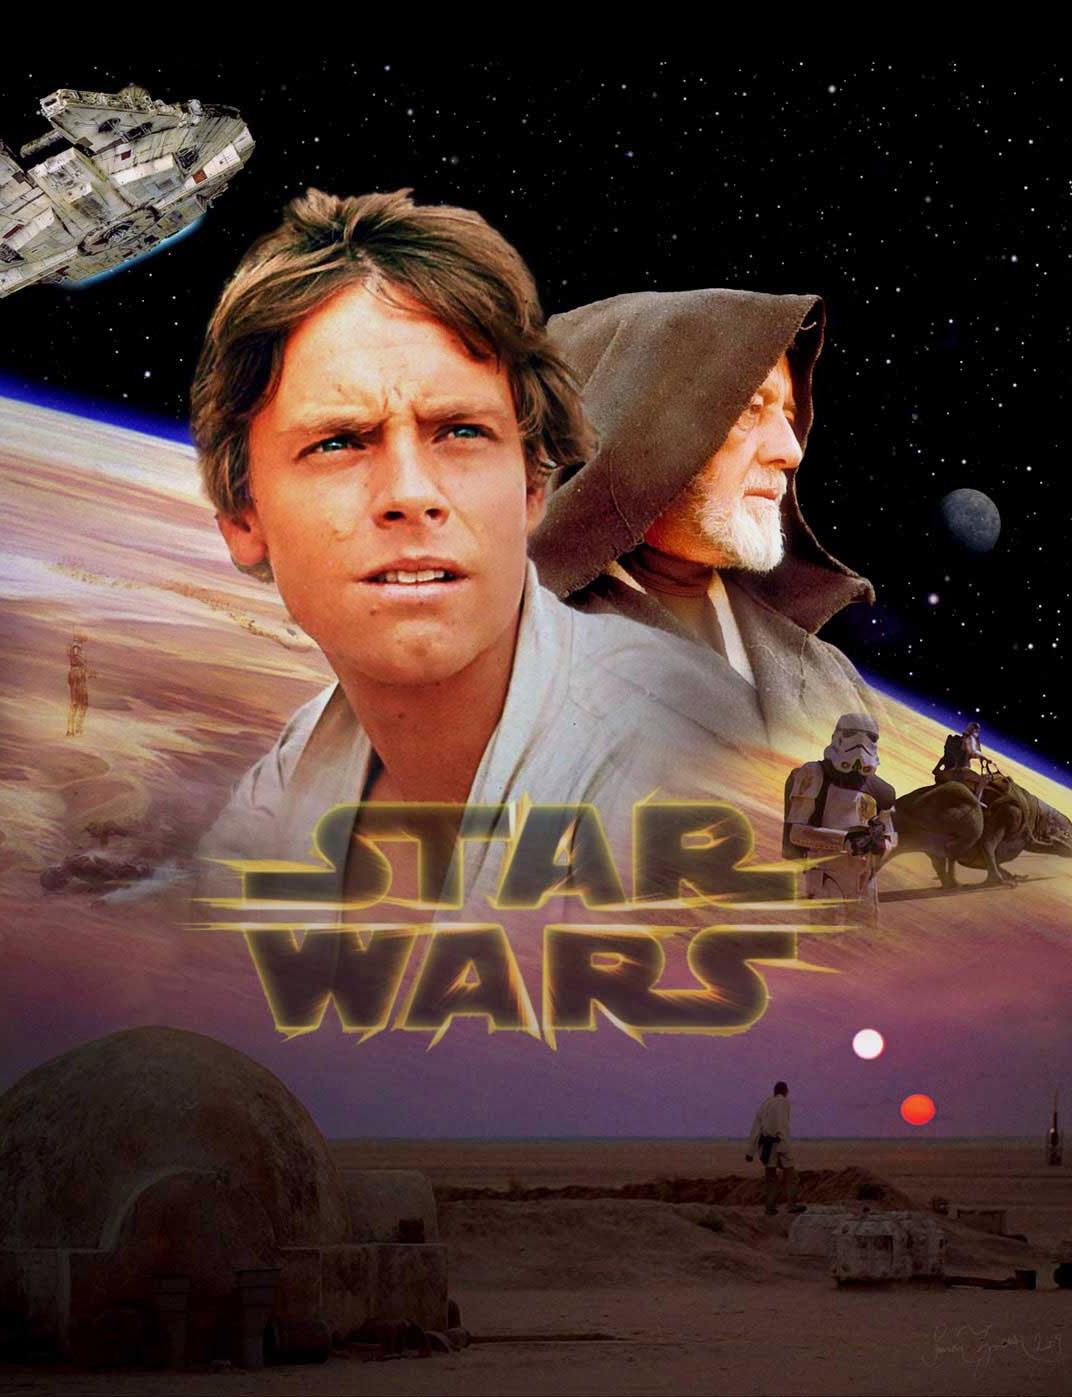 Star Wars - Tatooine Poster